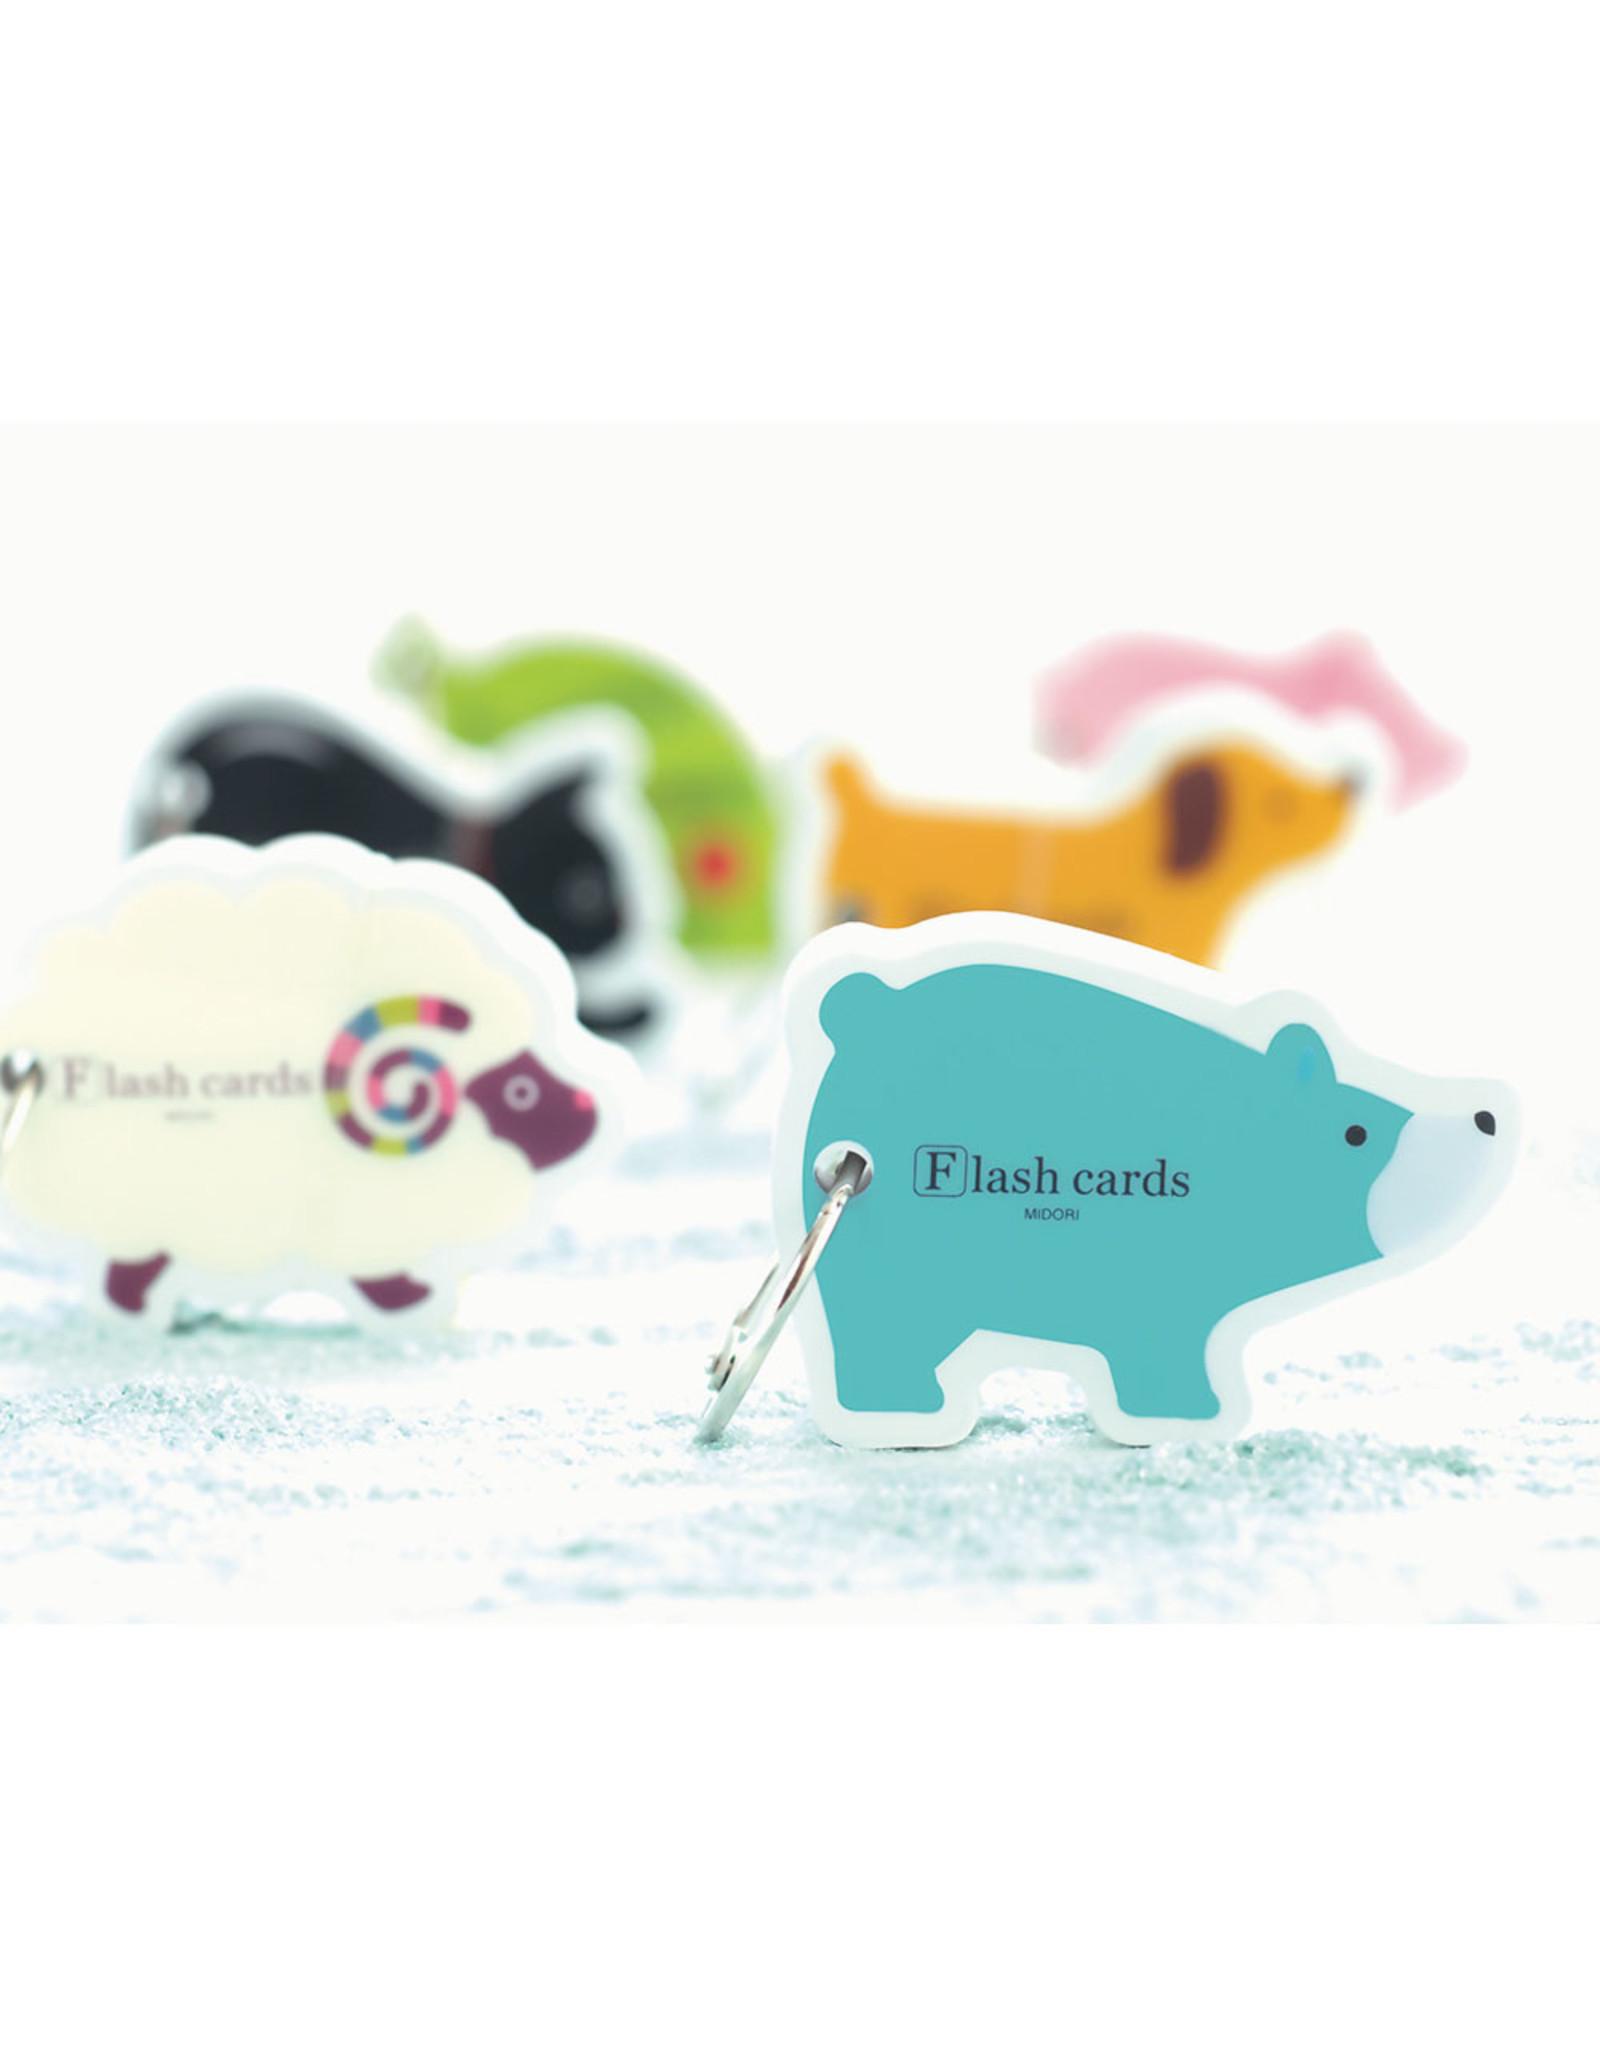 Designphil Inc. MIDORI FLASH CARD PIG (WORD CARD)